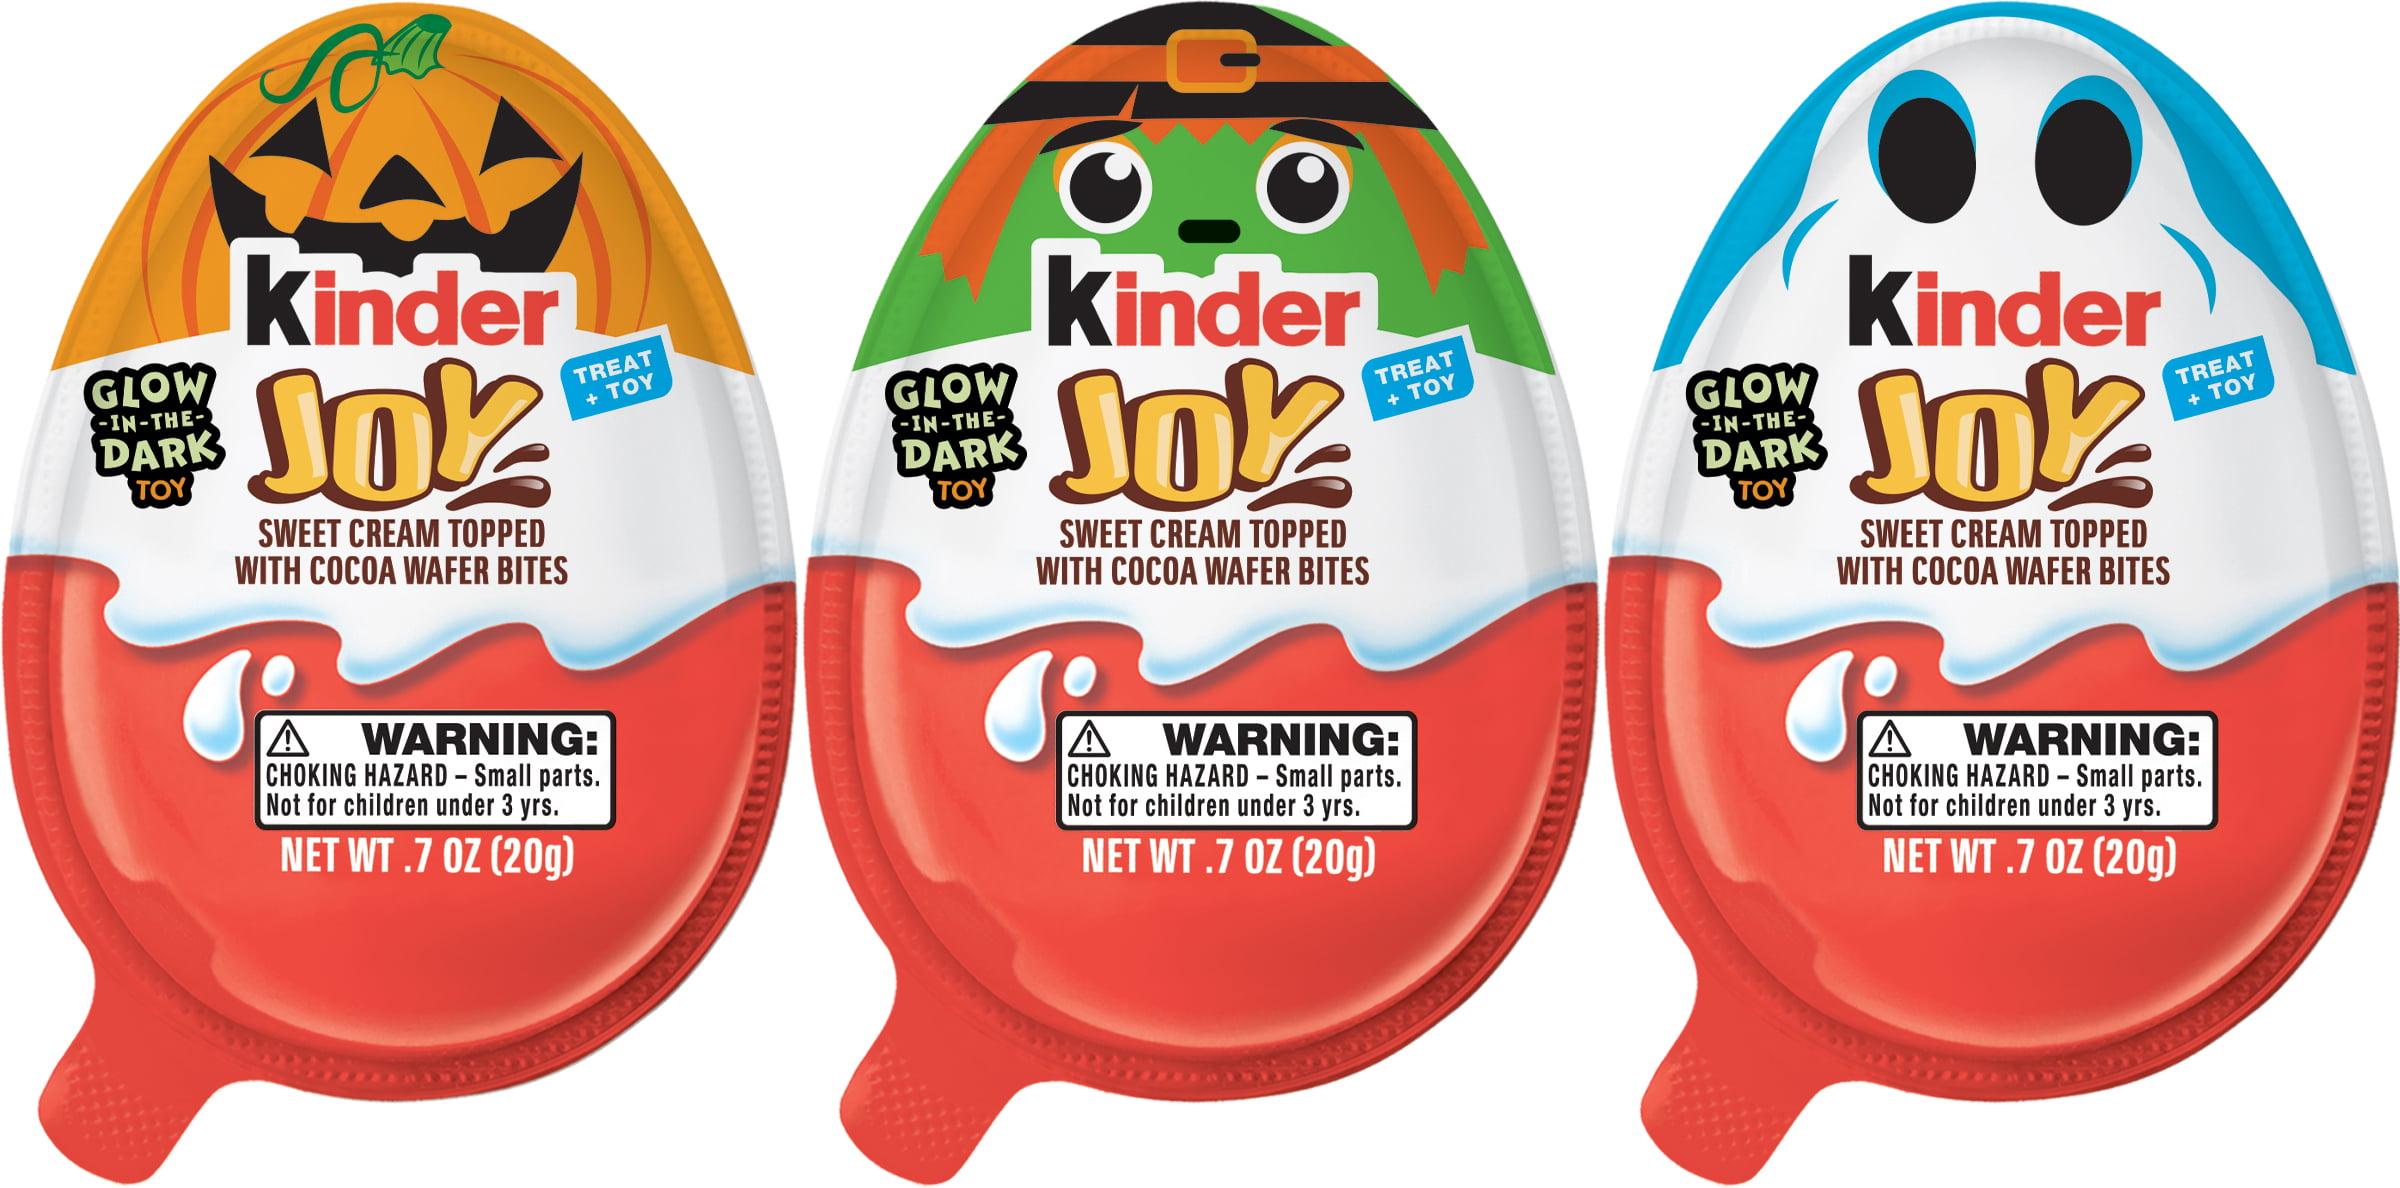 Kinder Joy Halloween Treat and Toy, 2.8 oz, 4 count